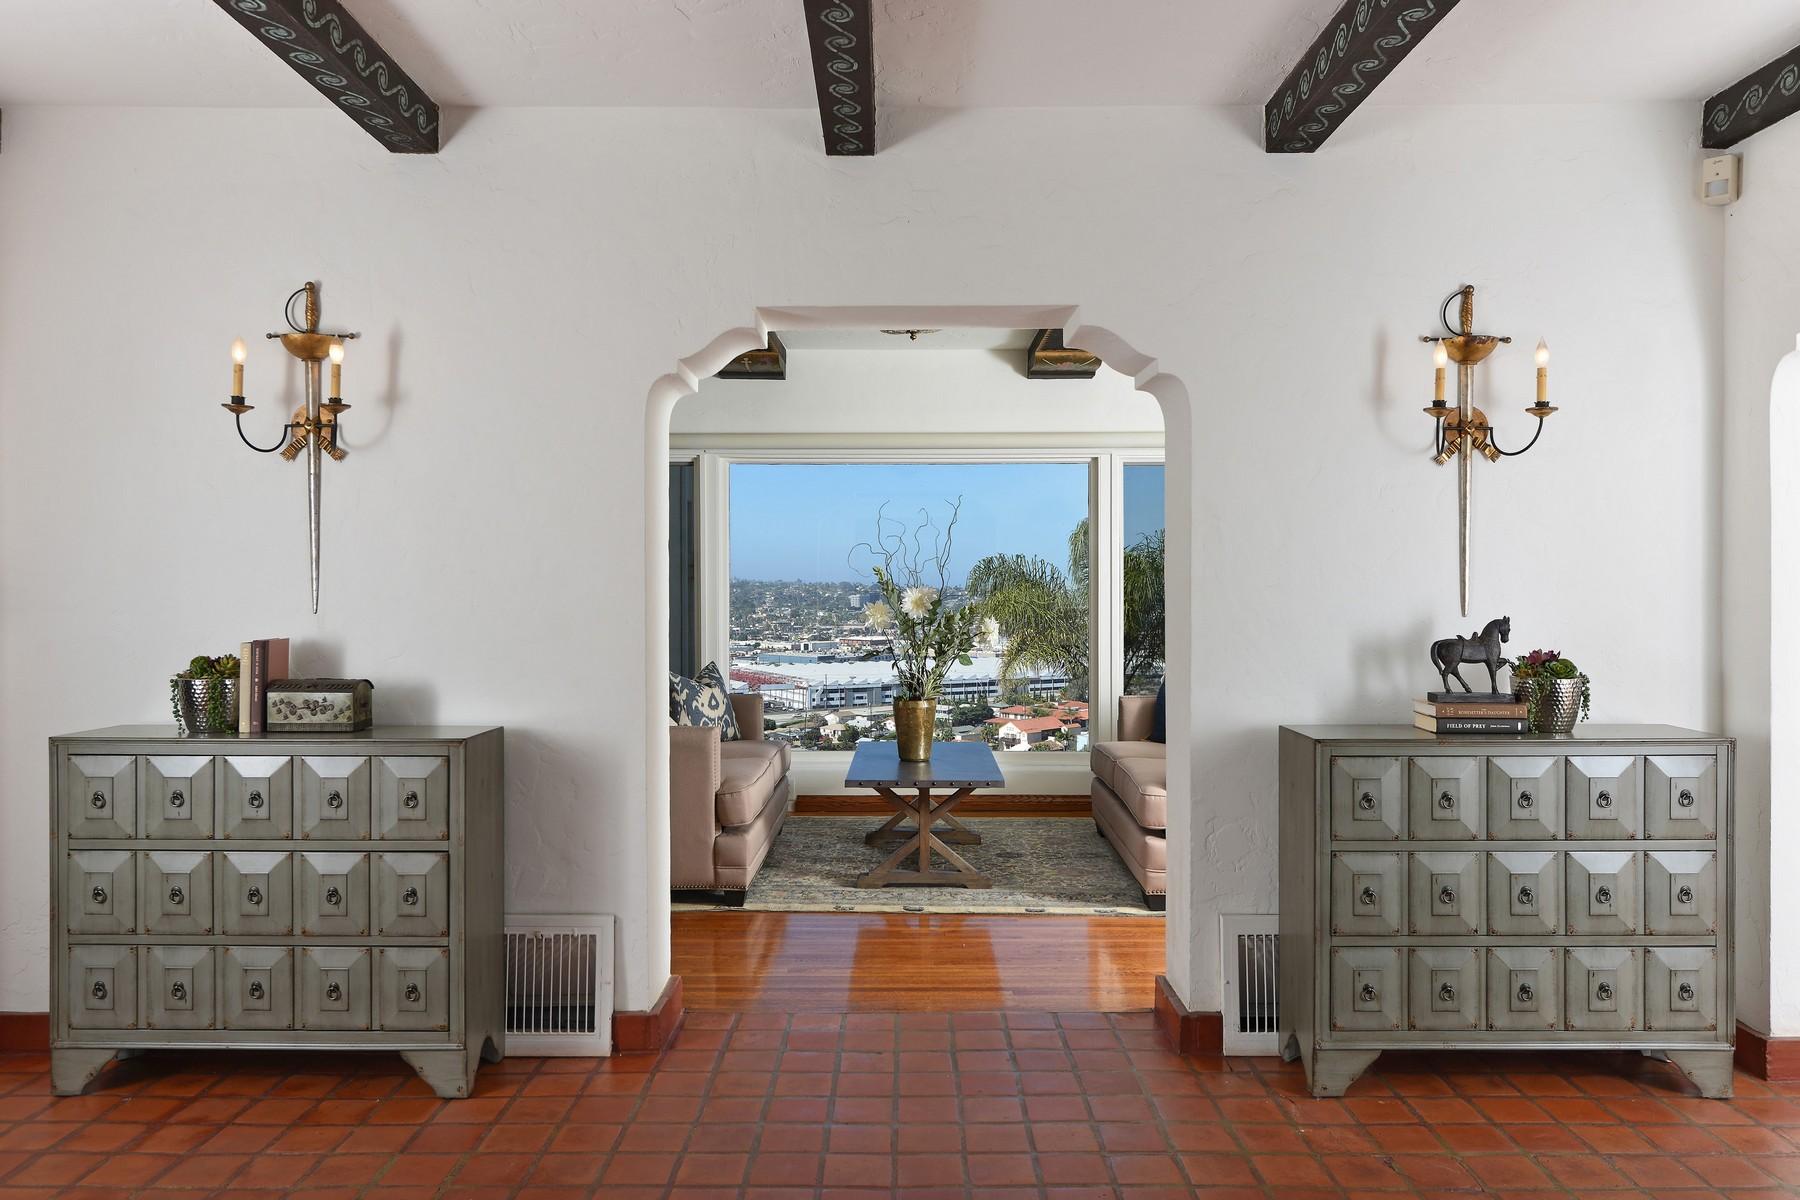 Additional photo for property listing at 2335 Juan  San Diego, Californie 92103 États-Unis